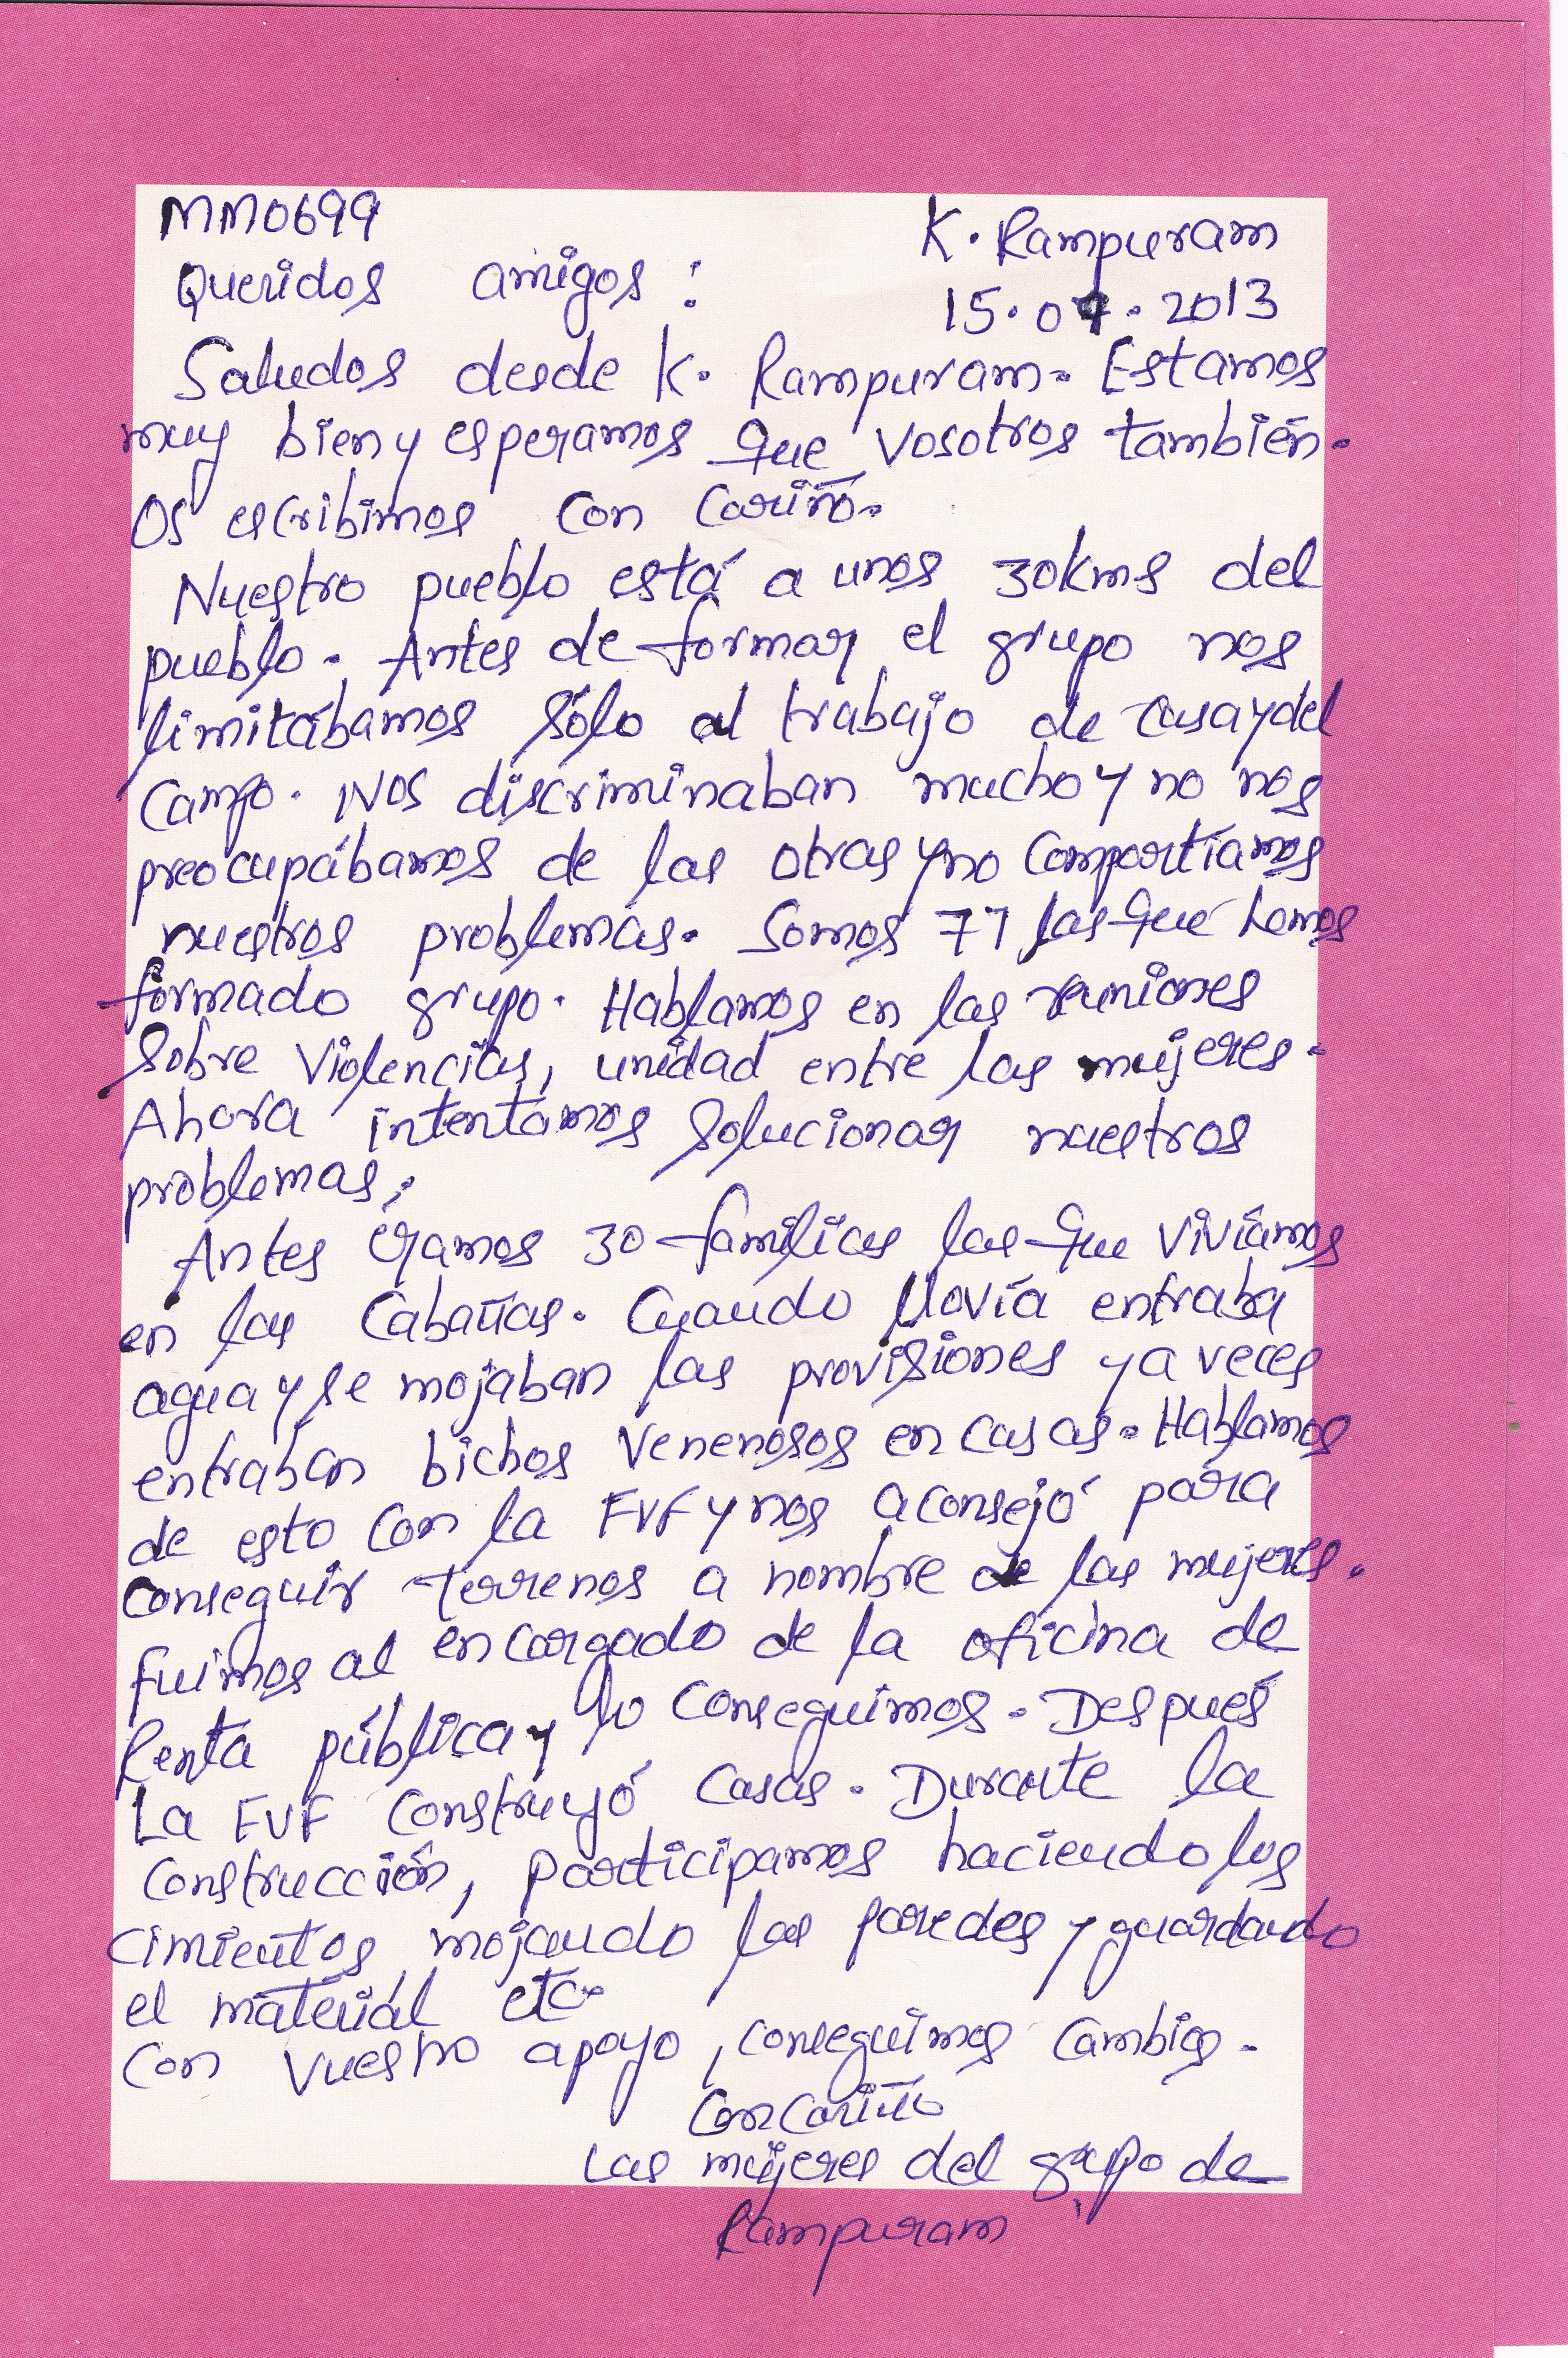 Carta del Shangam de mujeres de K. Rampuran